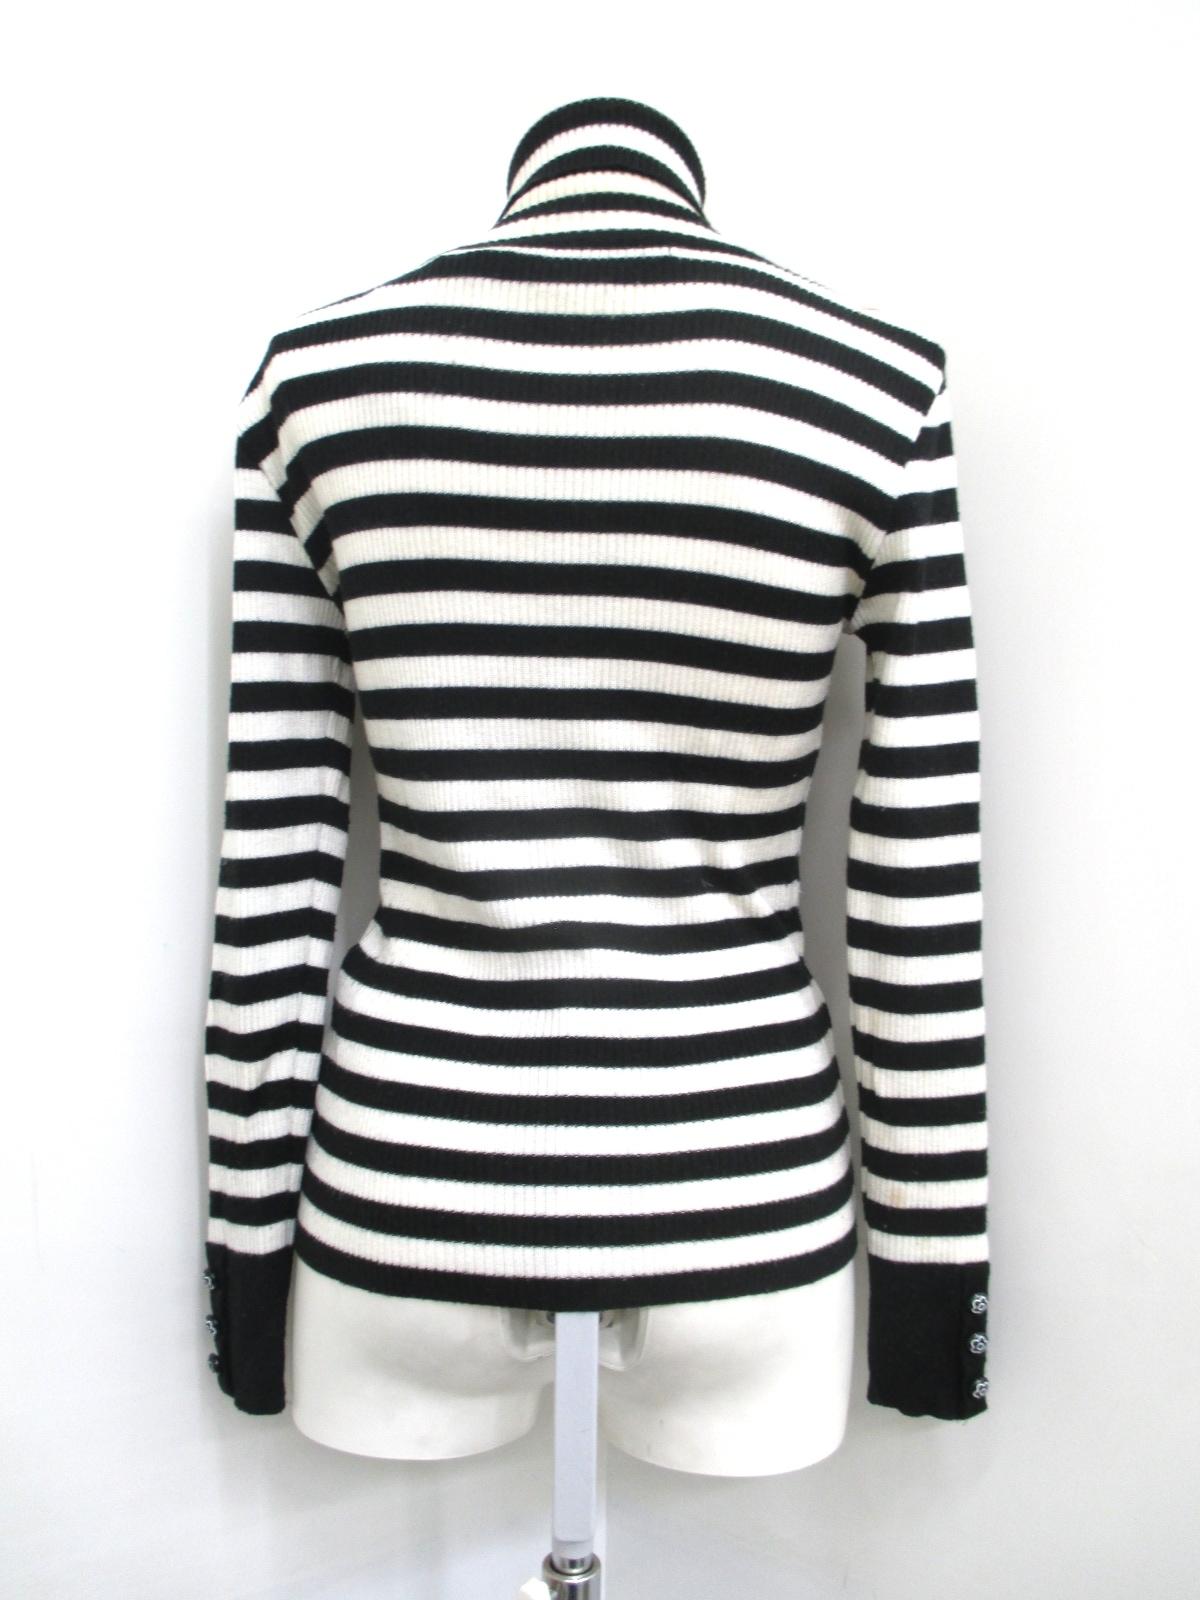 MARY QUANT(マリークワント)のセーター